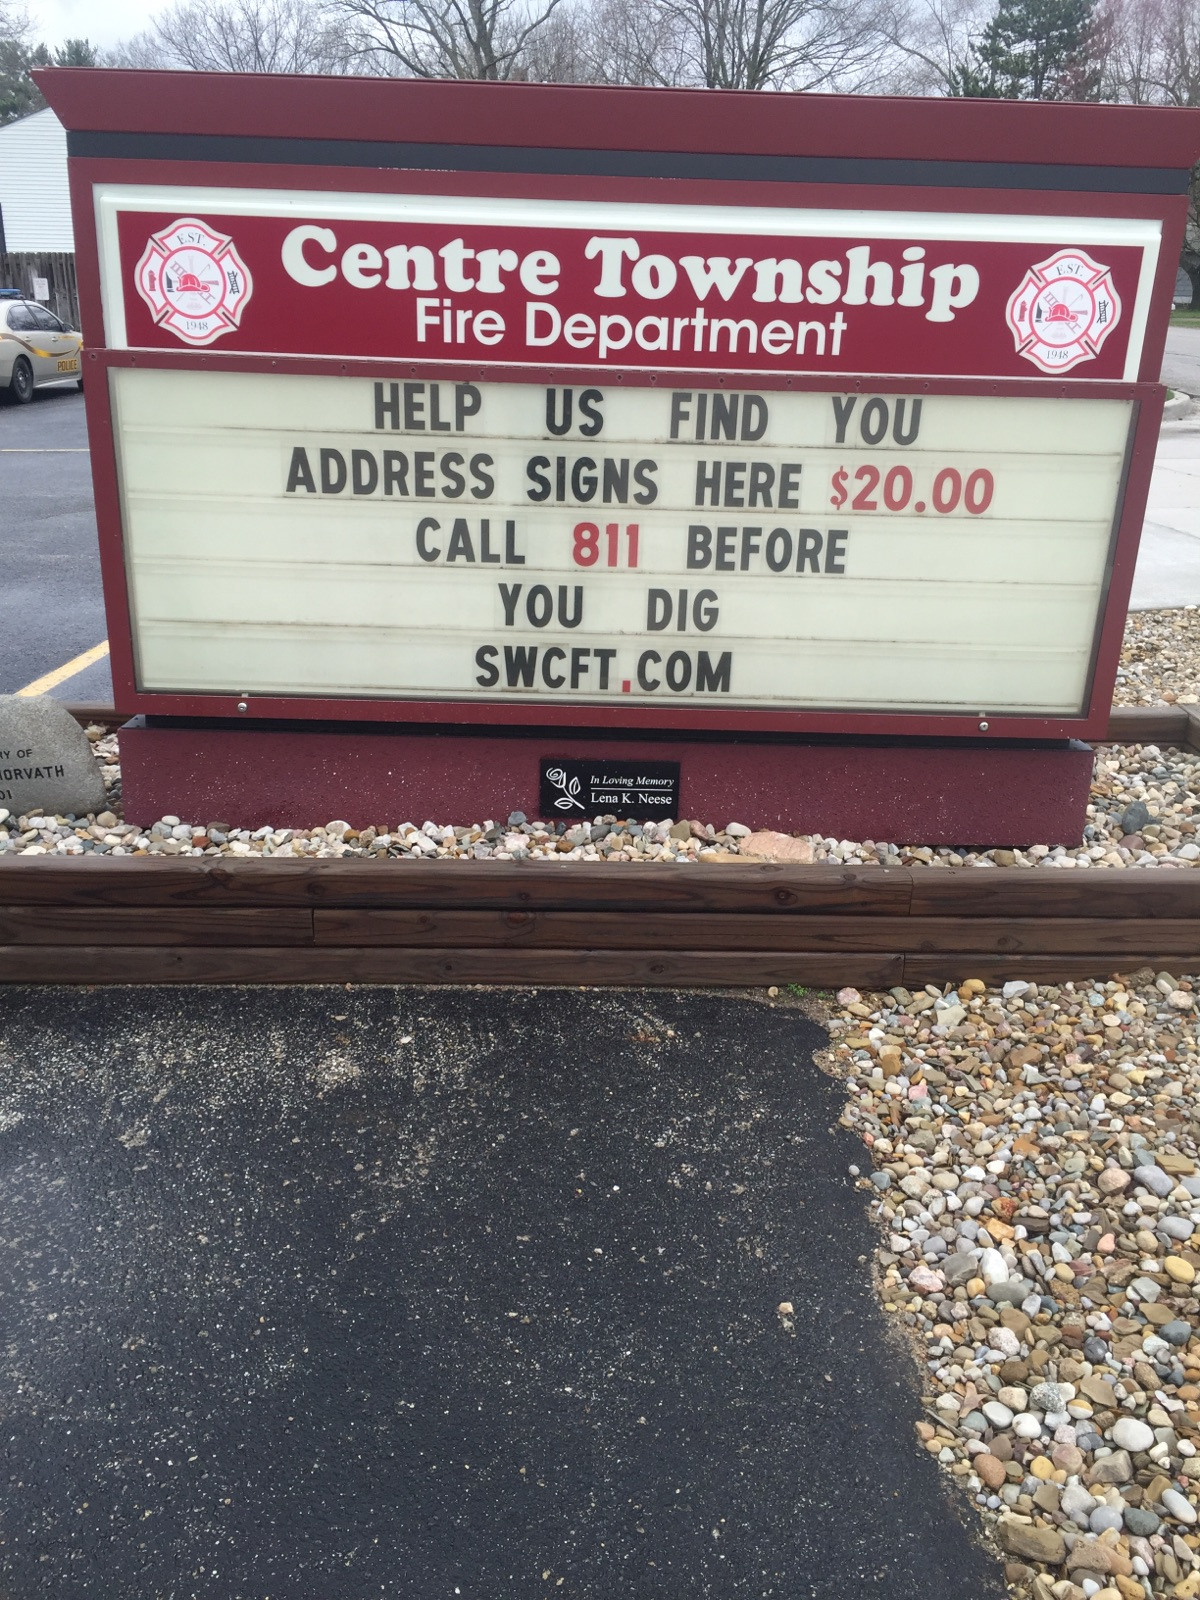 Centre Township Fire Department